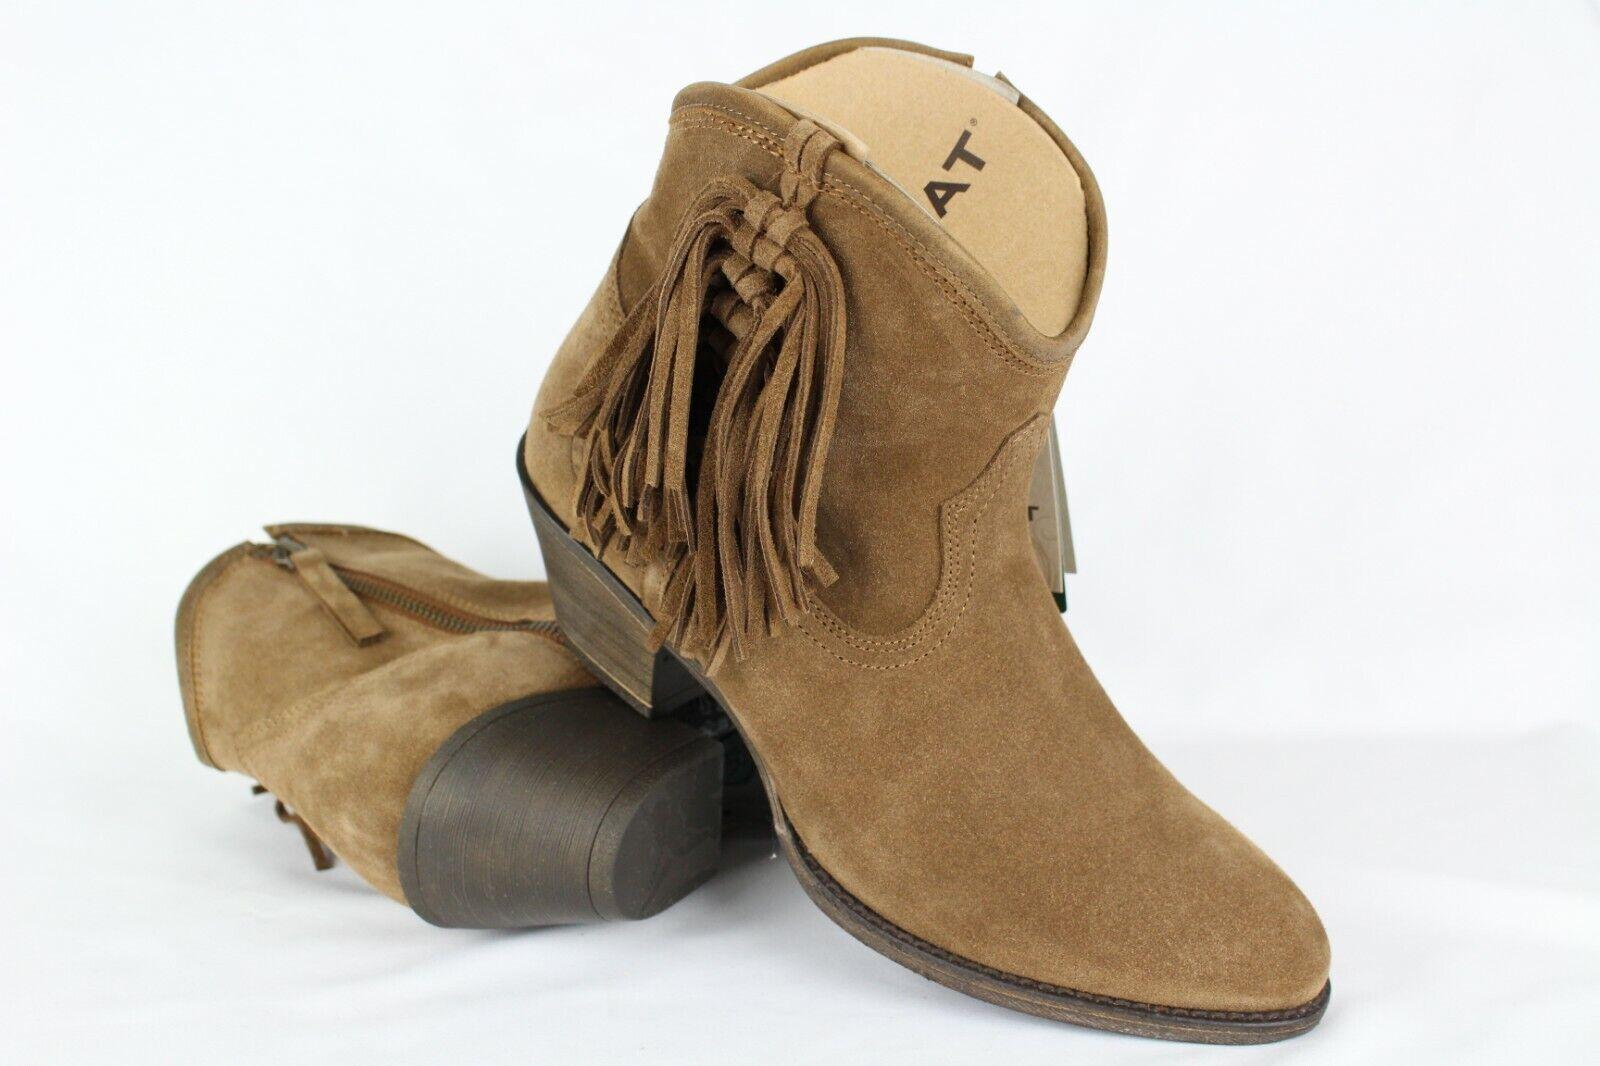 New Ariat Women's Duchess Fringe Ankle Boots Cowboy Boots 8m 10021630